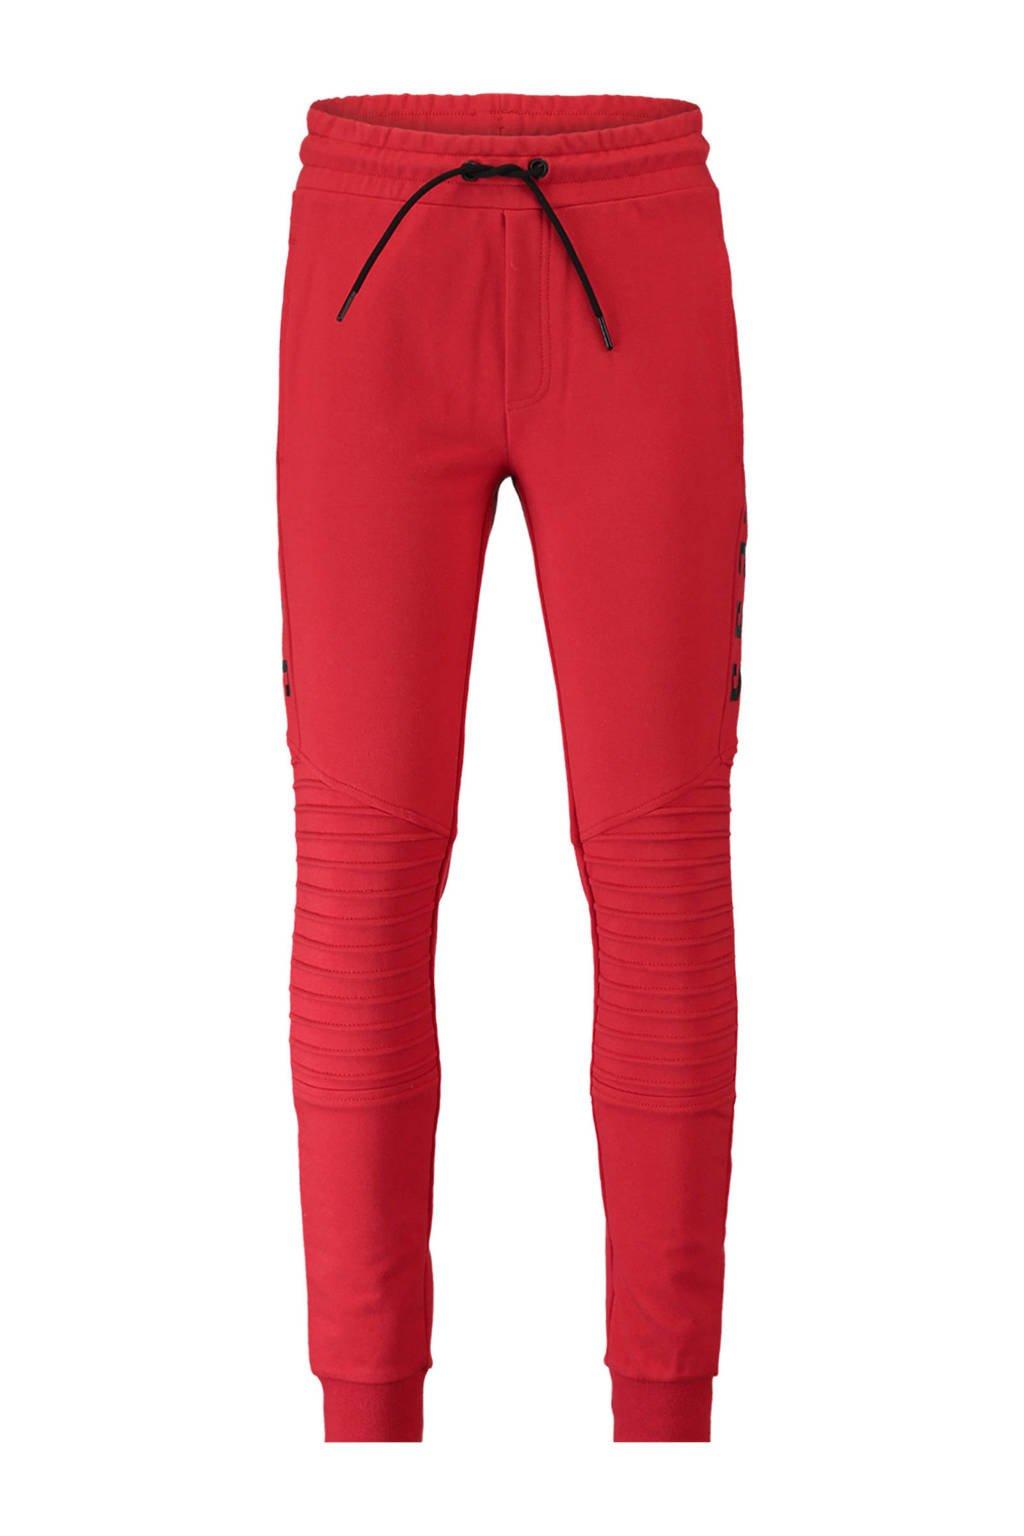 CoolCat   joggingbroek met ribbels rood, Rood